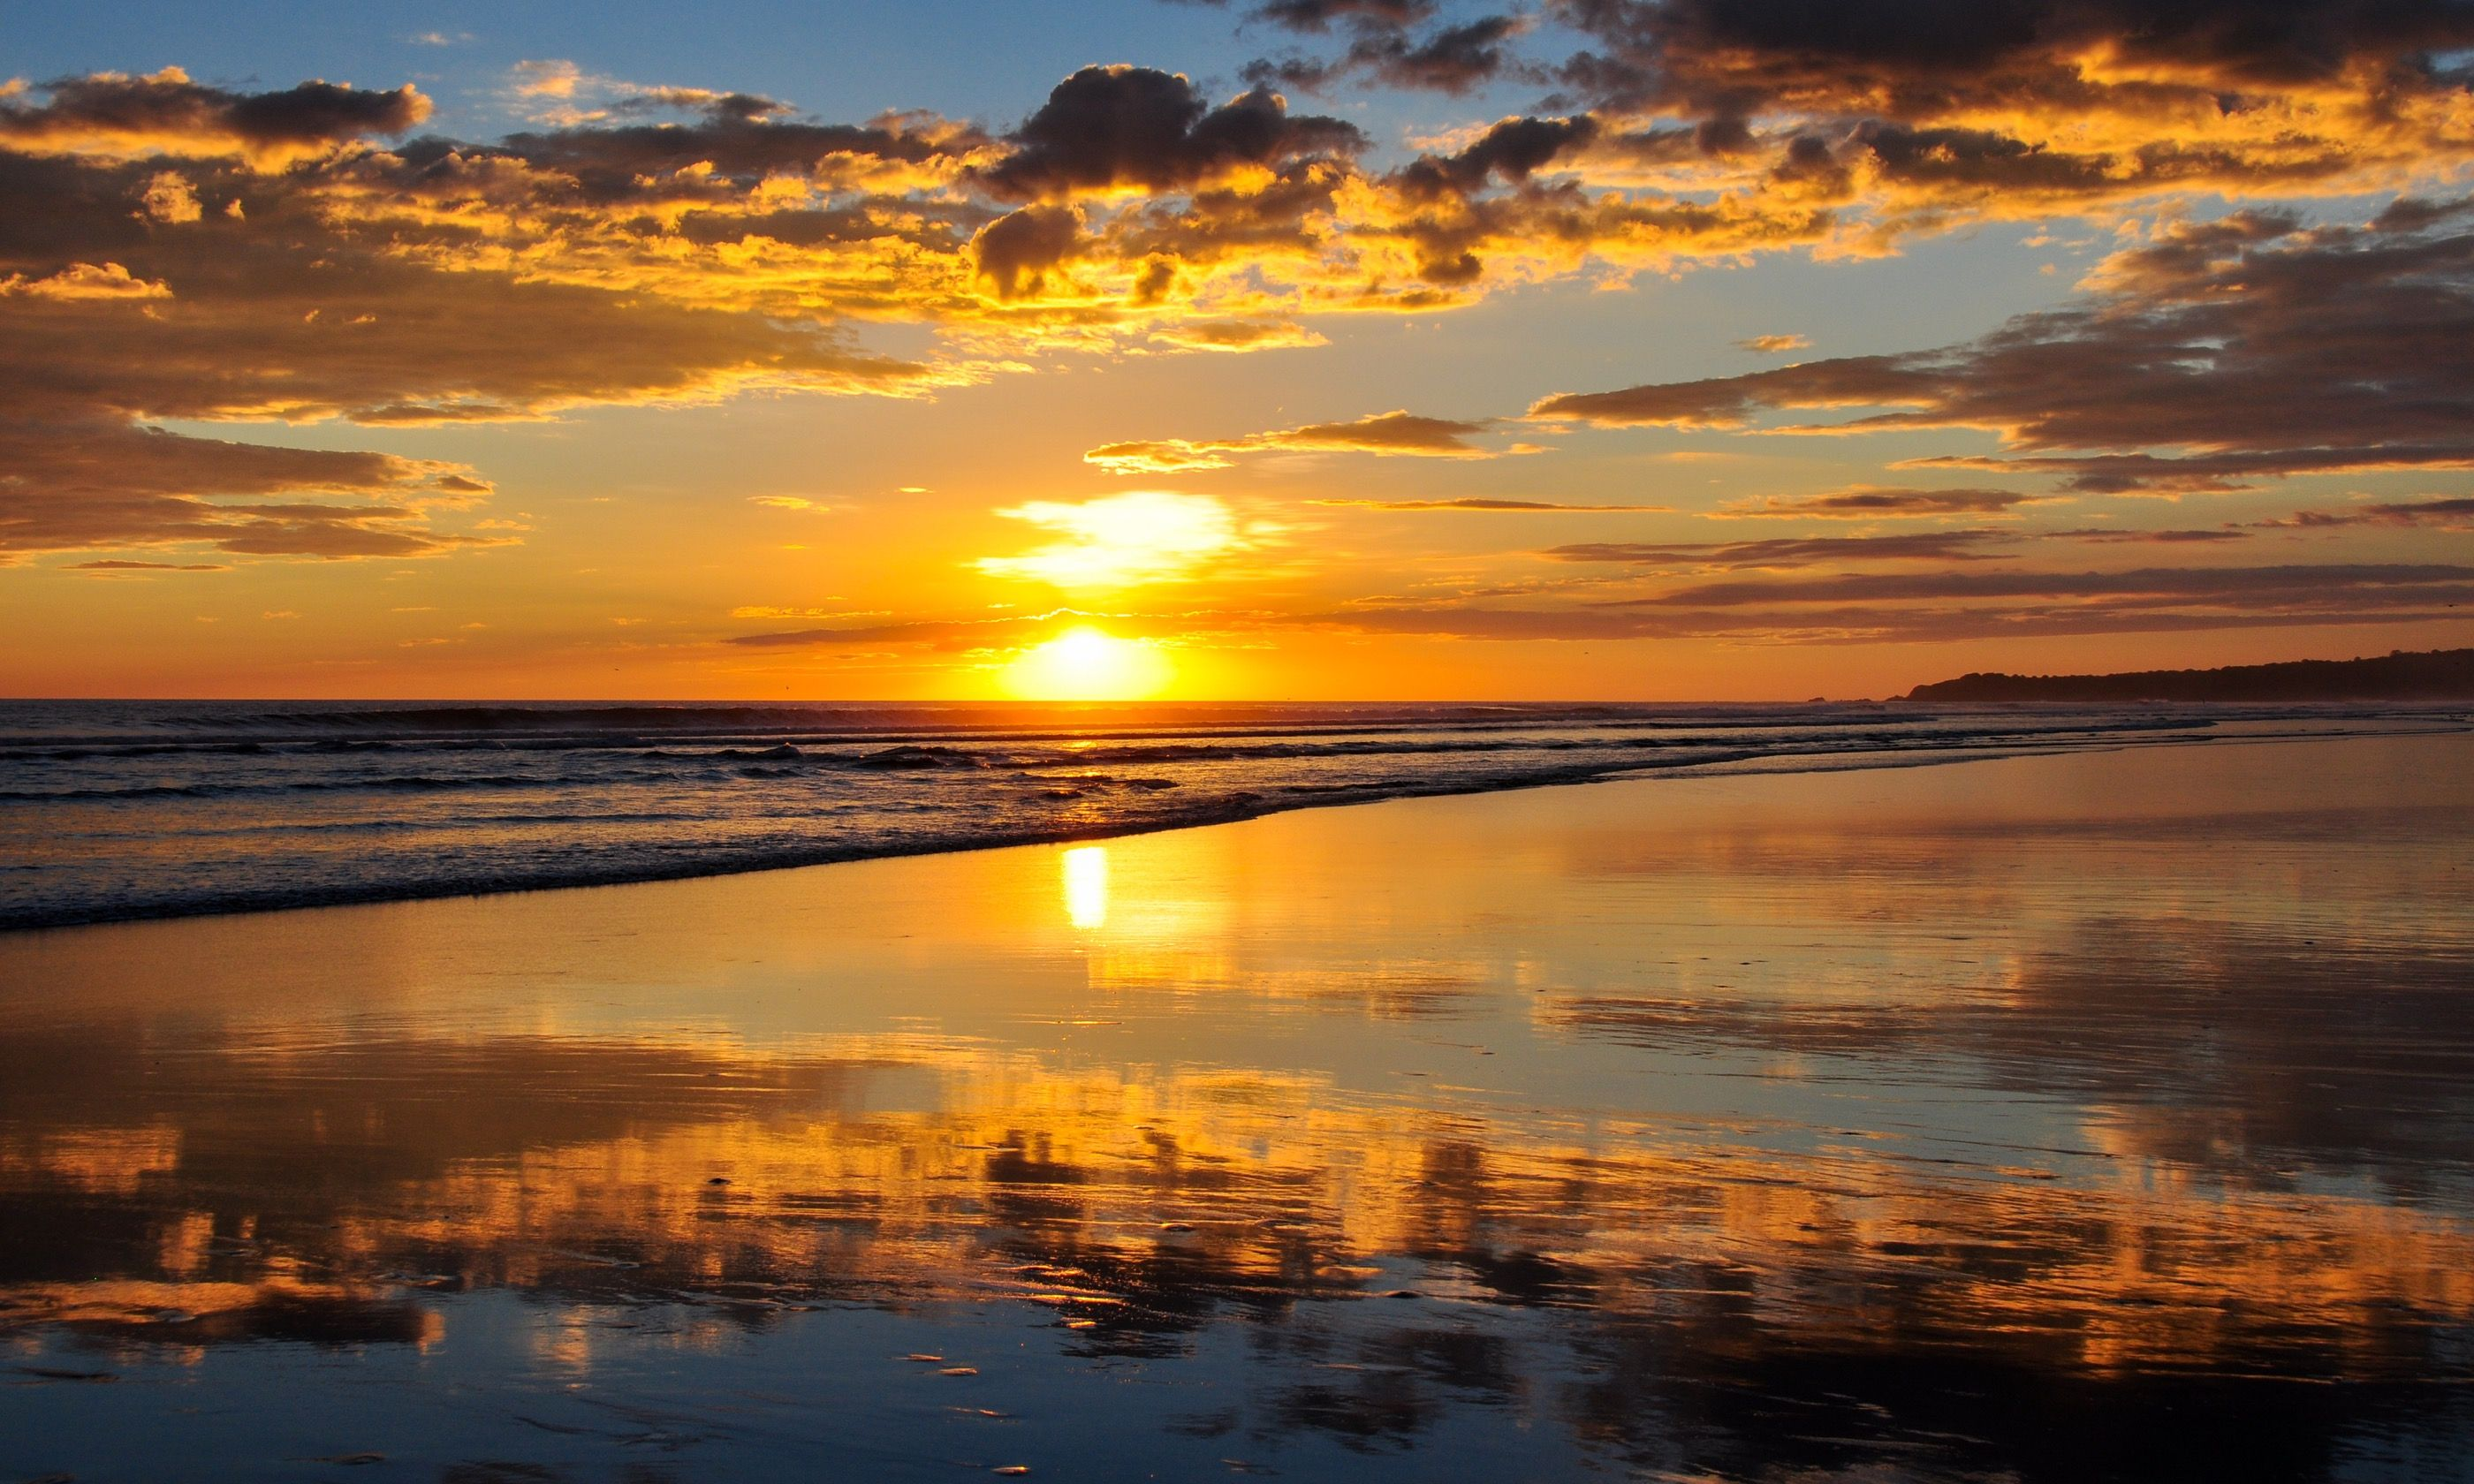 Sunset at Playa El Cuco, El Salvador (Dreamstime)